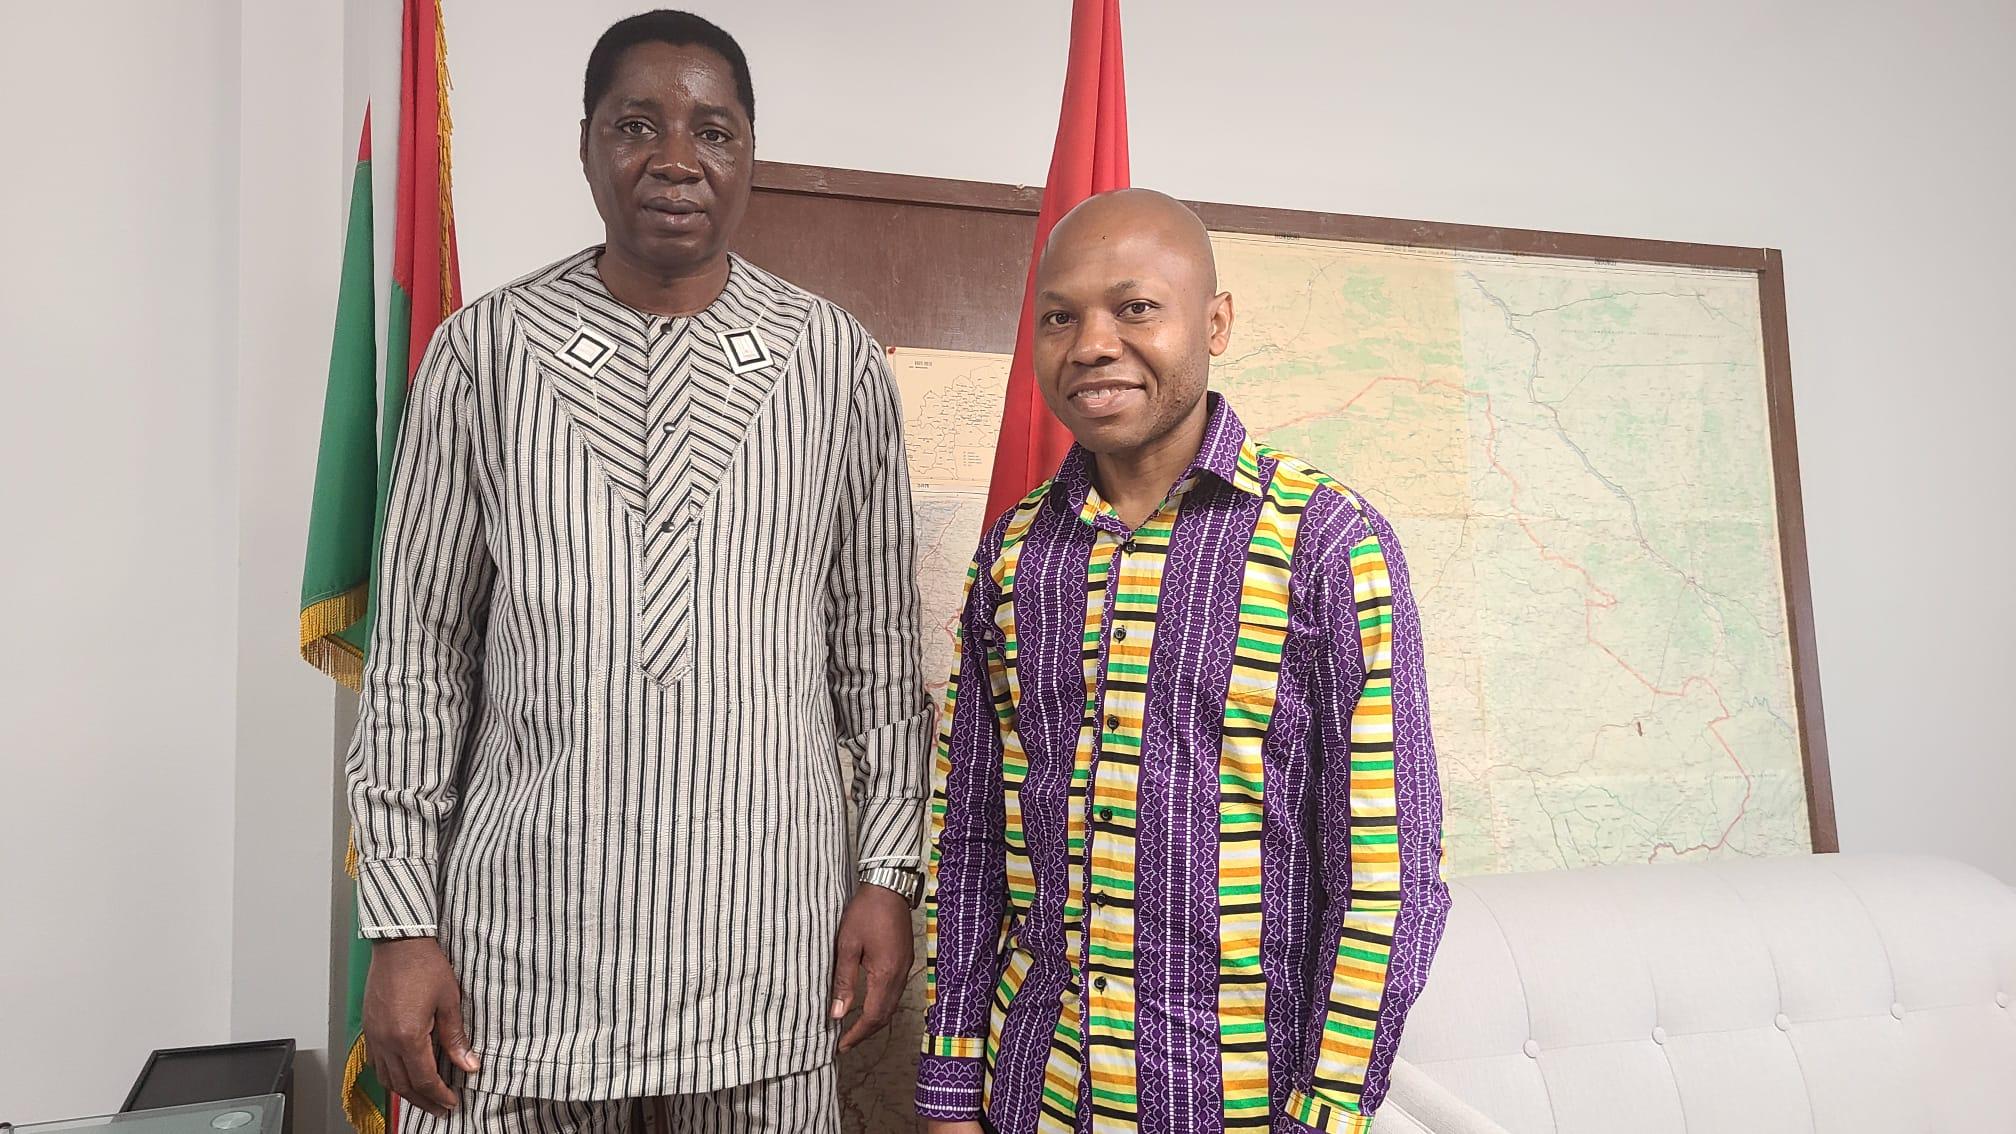 Avec Son Excellence Athanase Boudo, Ambassadeur du Burkina Faso au Canada.